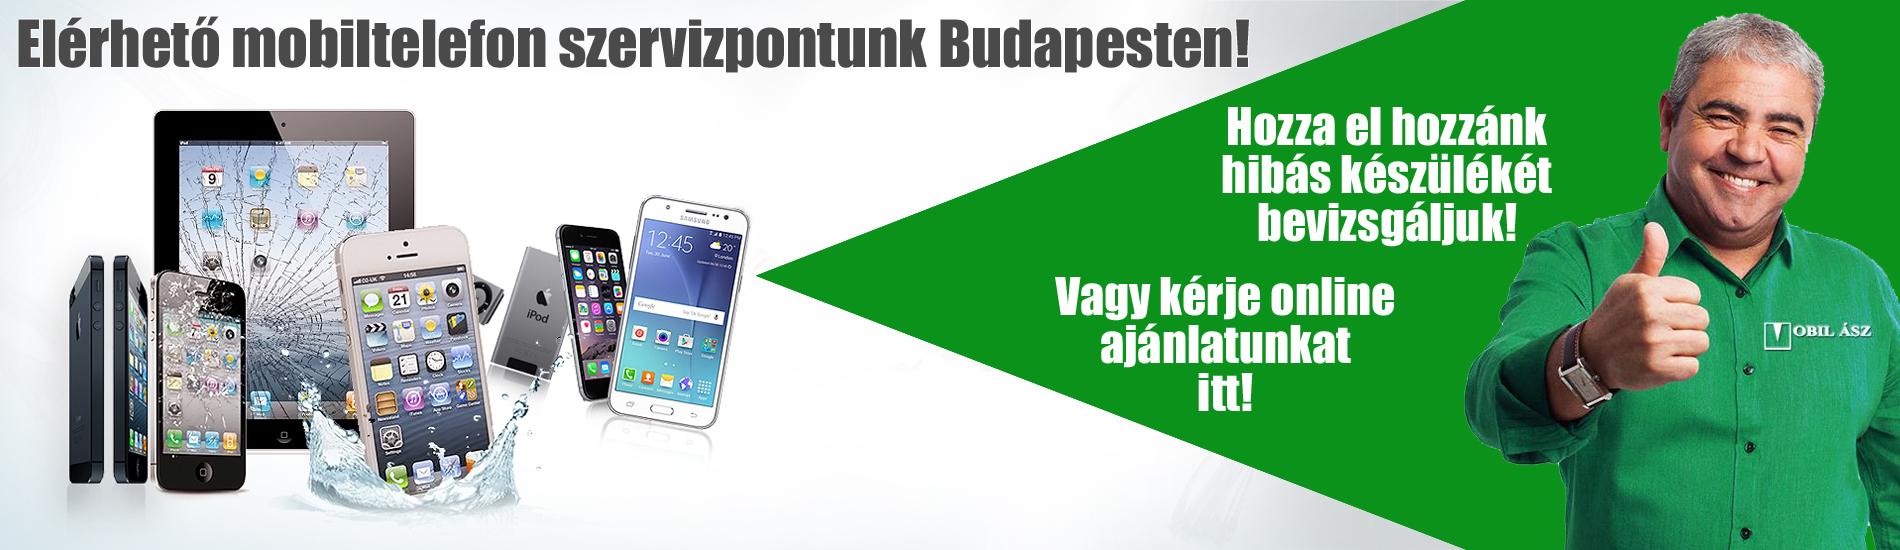 Mobiltelefon szervizpontunk Budapesten